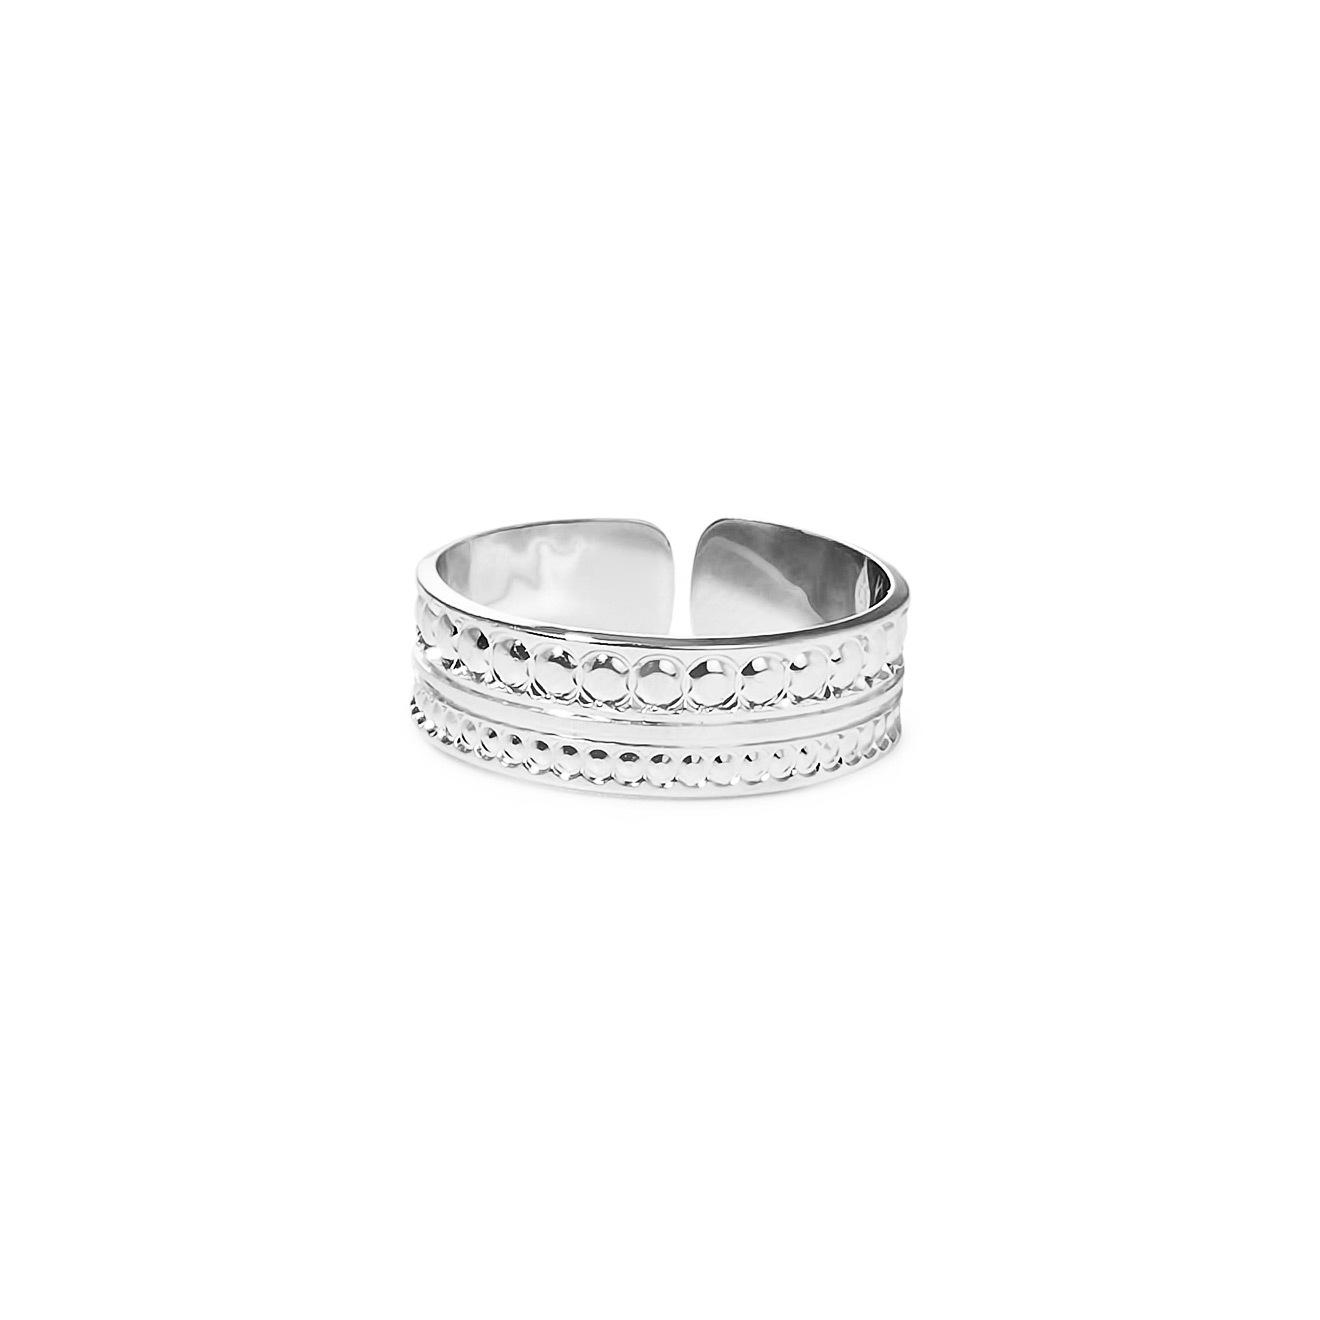 Mya Bay Покрытое серебром кольцо Little Maharaja